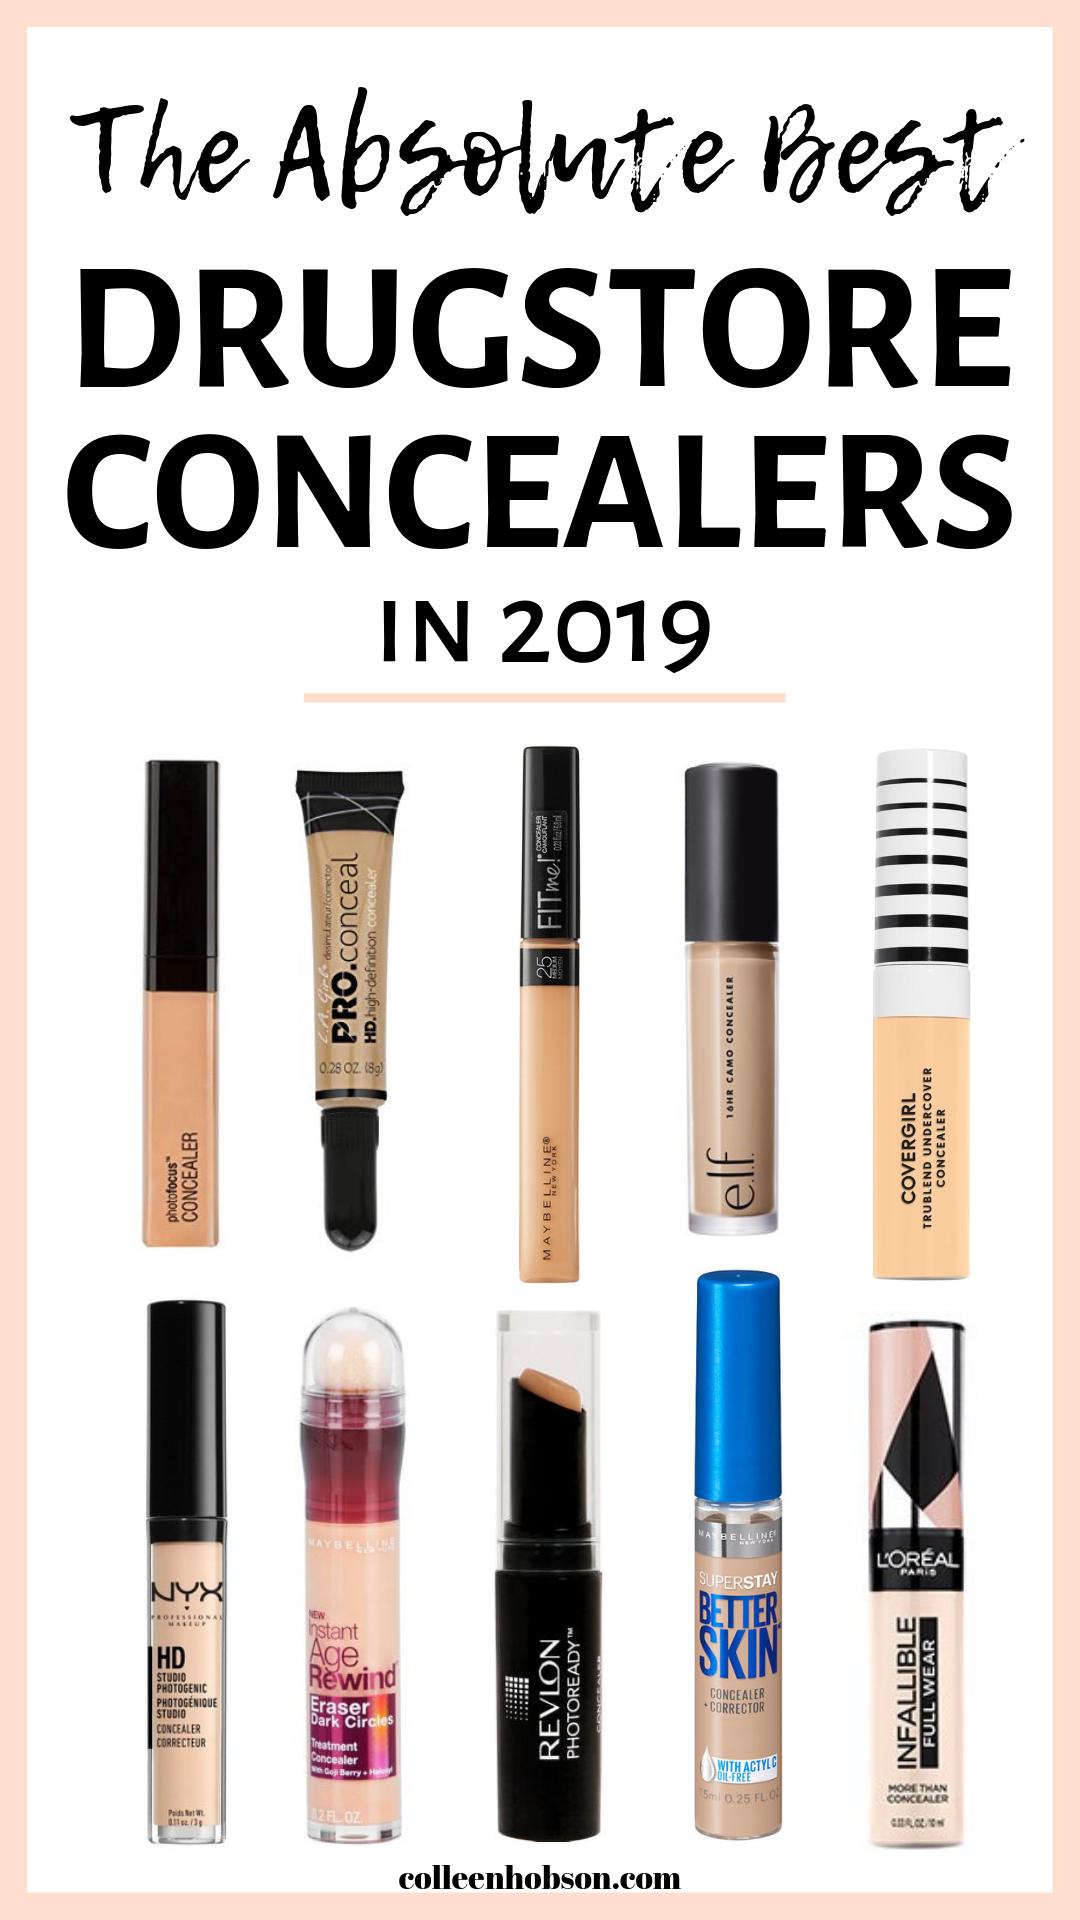 The 10 Best Drugstore Concealers On The Market Today In 2020 Best Drugstore Concealer Drugstore Concealer Best Drugstore Makeup